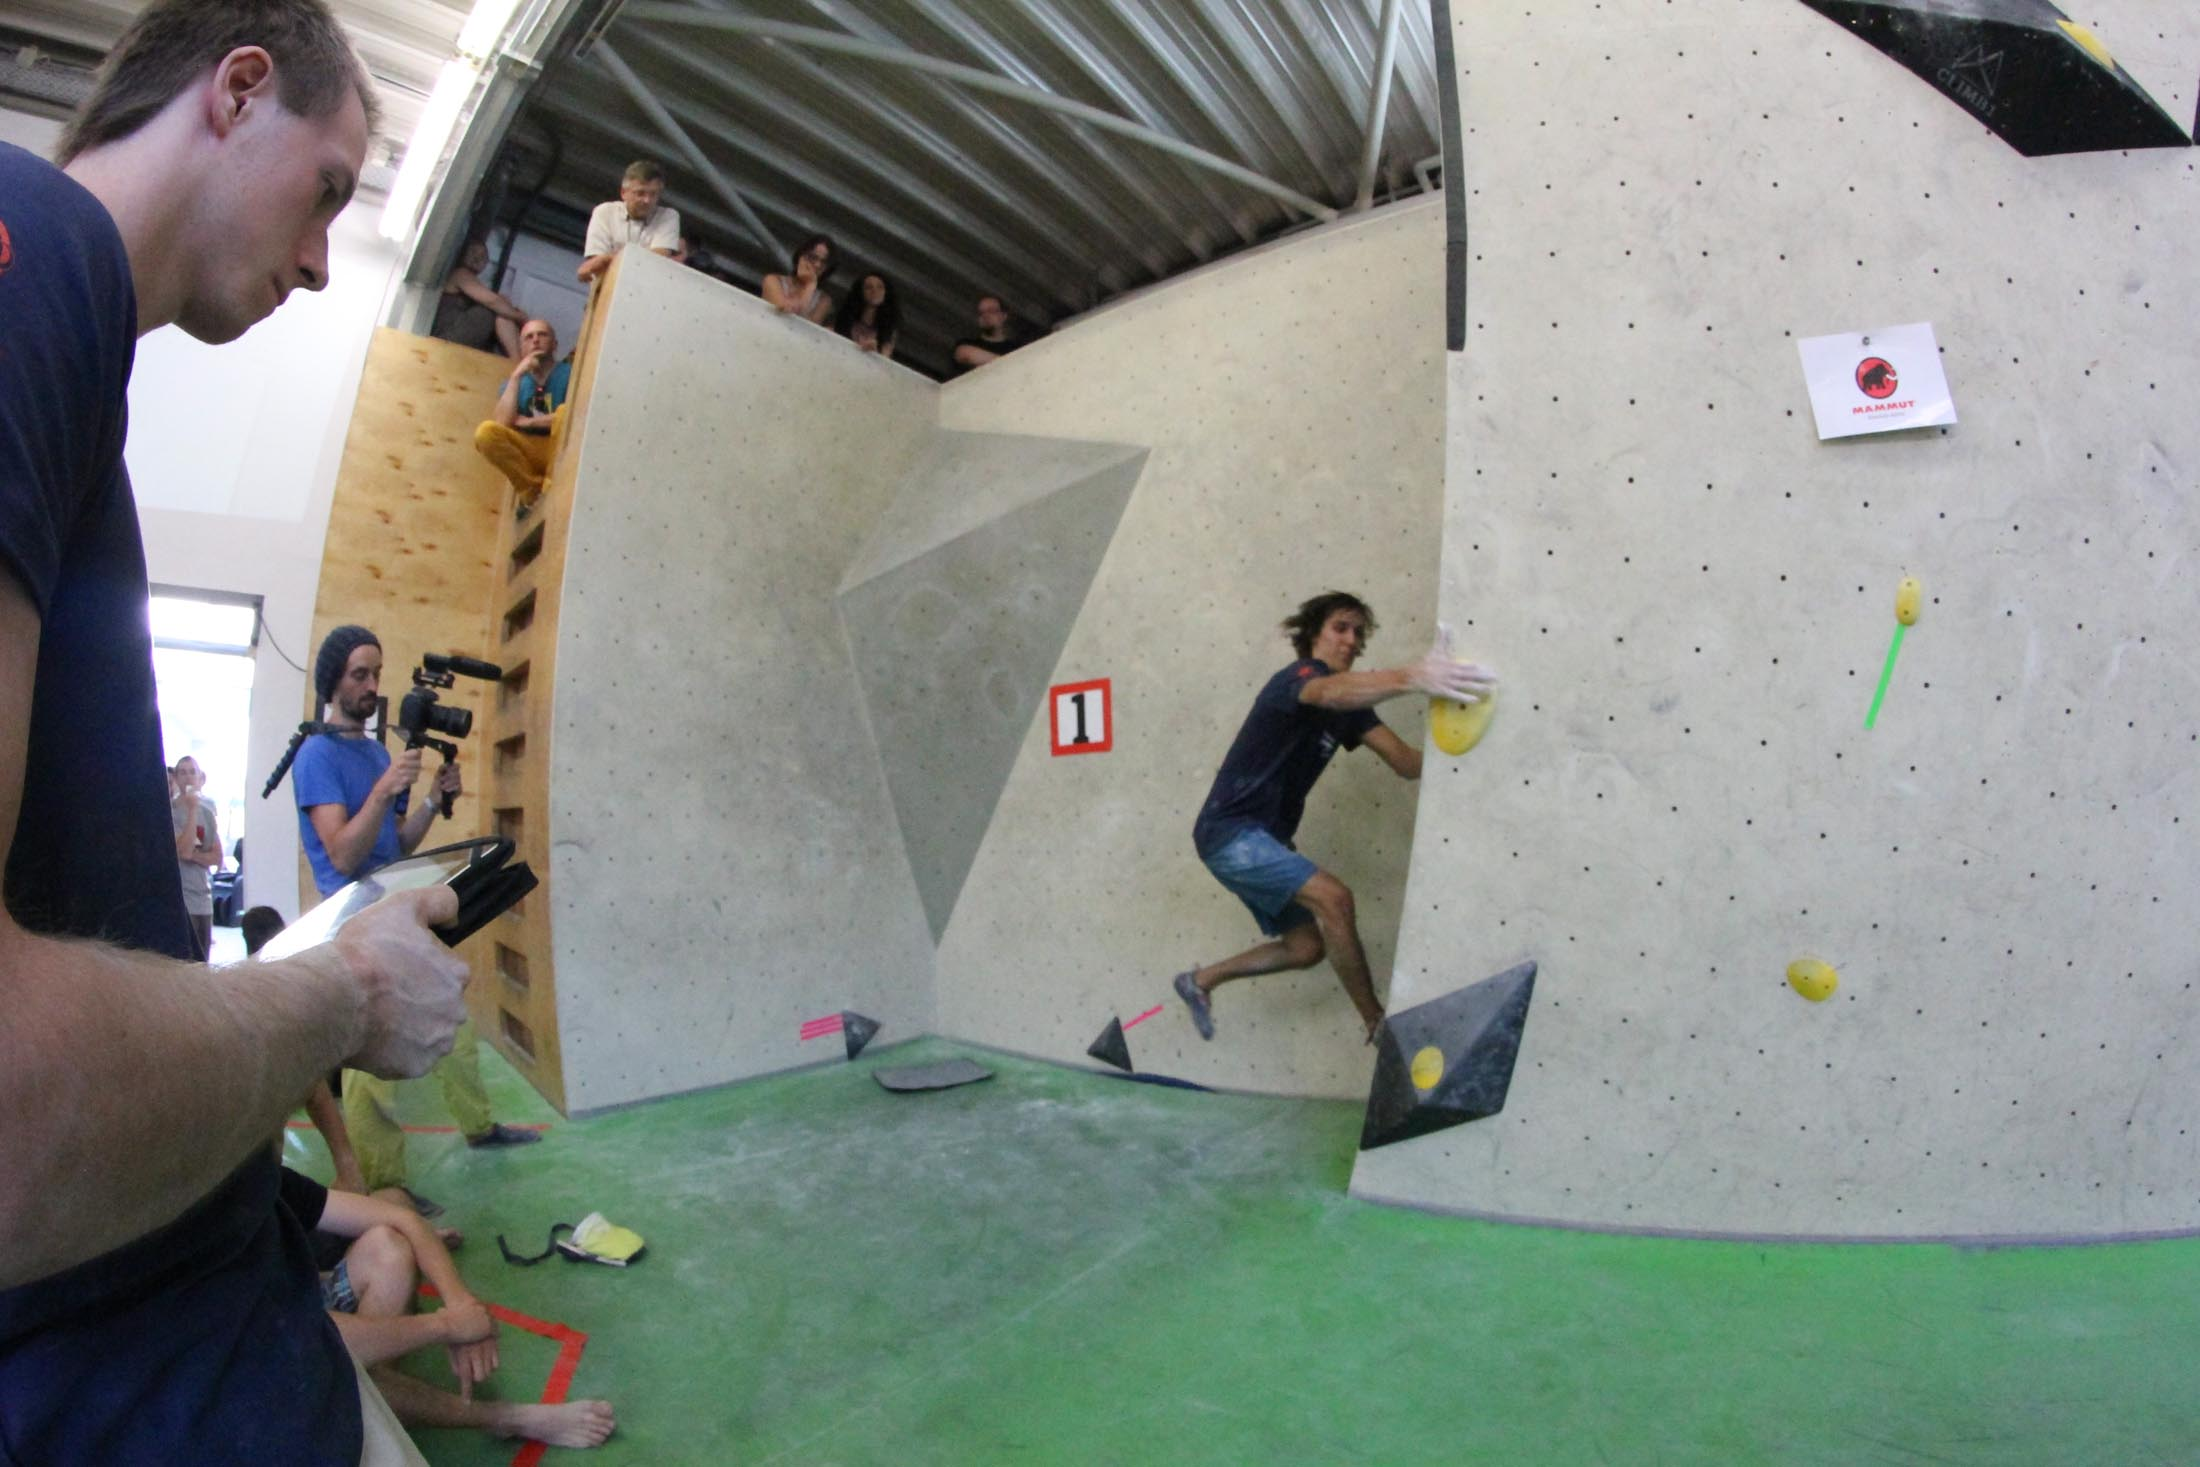 Finale, internationaler bouldercup Frankenjura 2016, BLOCKHELDEN Erlangen, Mammut, Bergfreunde.de, Boulderwettkampf07092016555